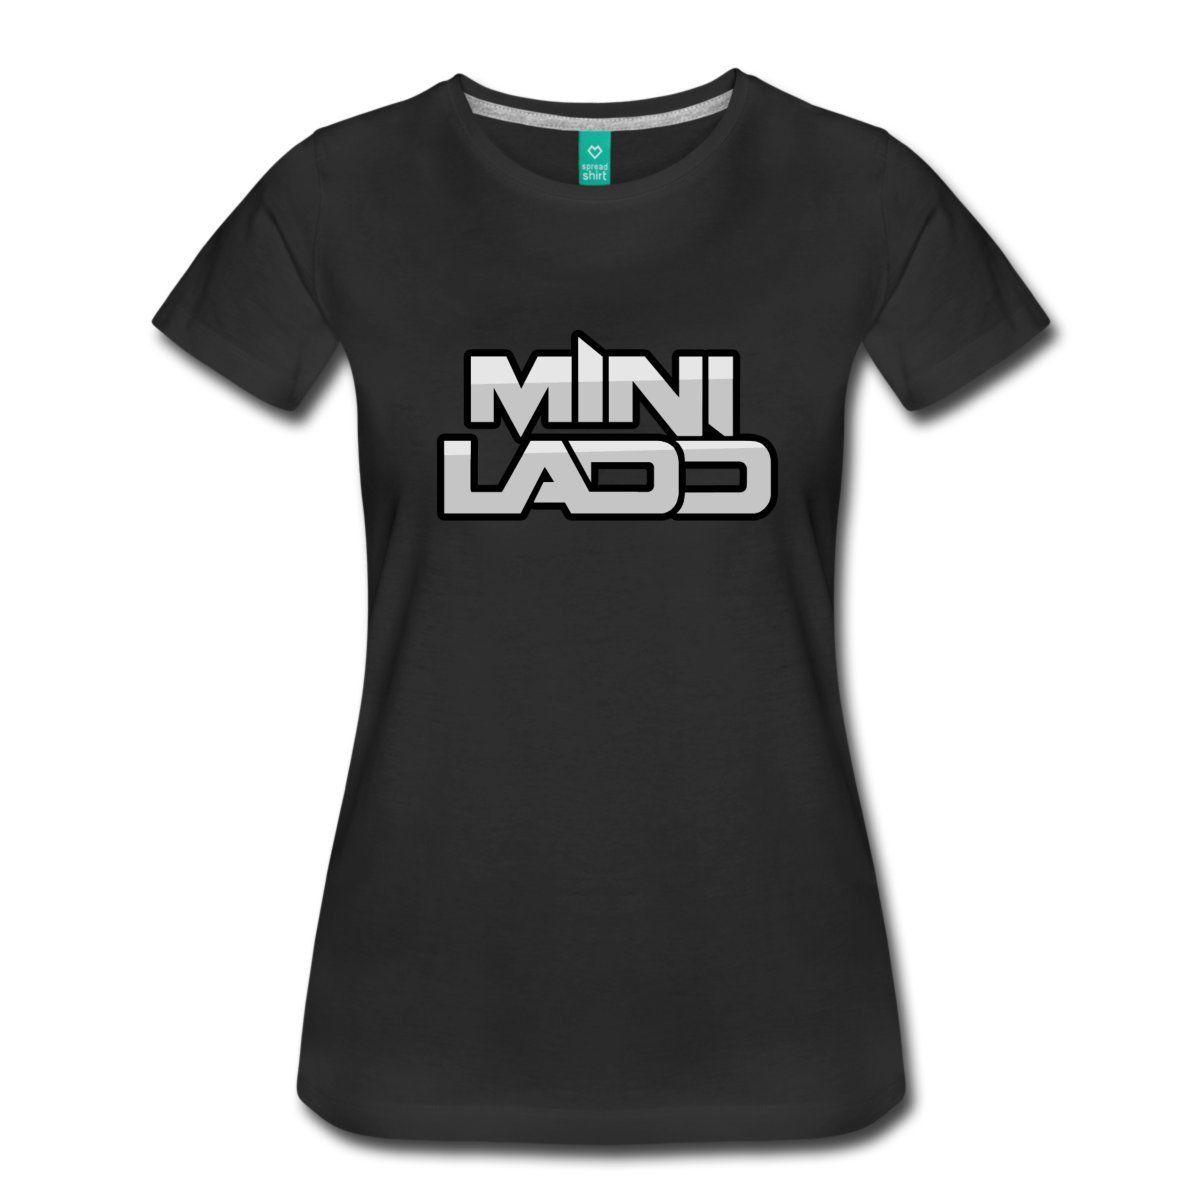 T shirt japanese design - Mini Ladd Logo Women S T Shirt New Arrival Summer Style Design Tops Hot Salestee Shirts